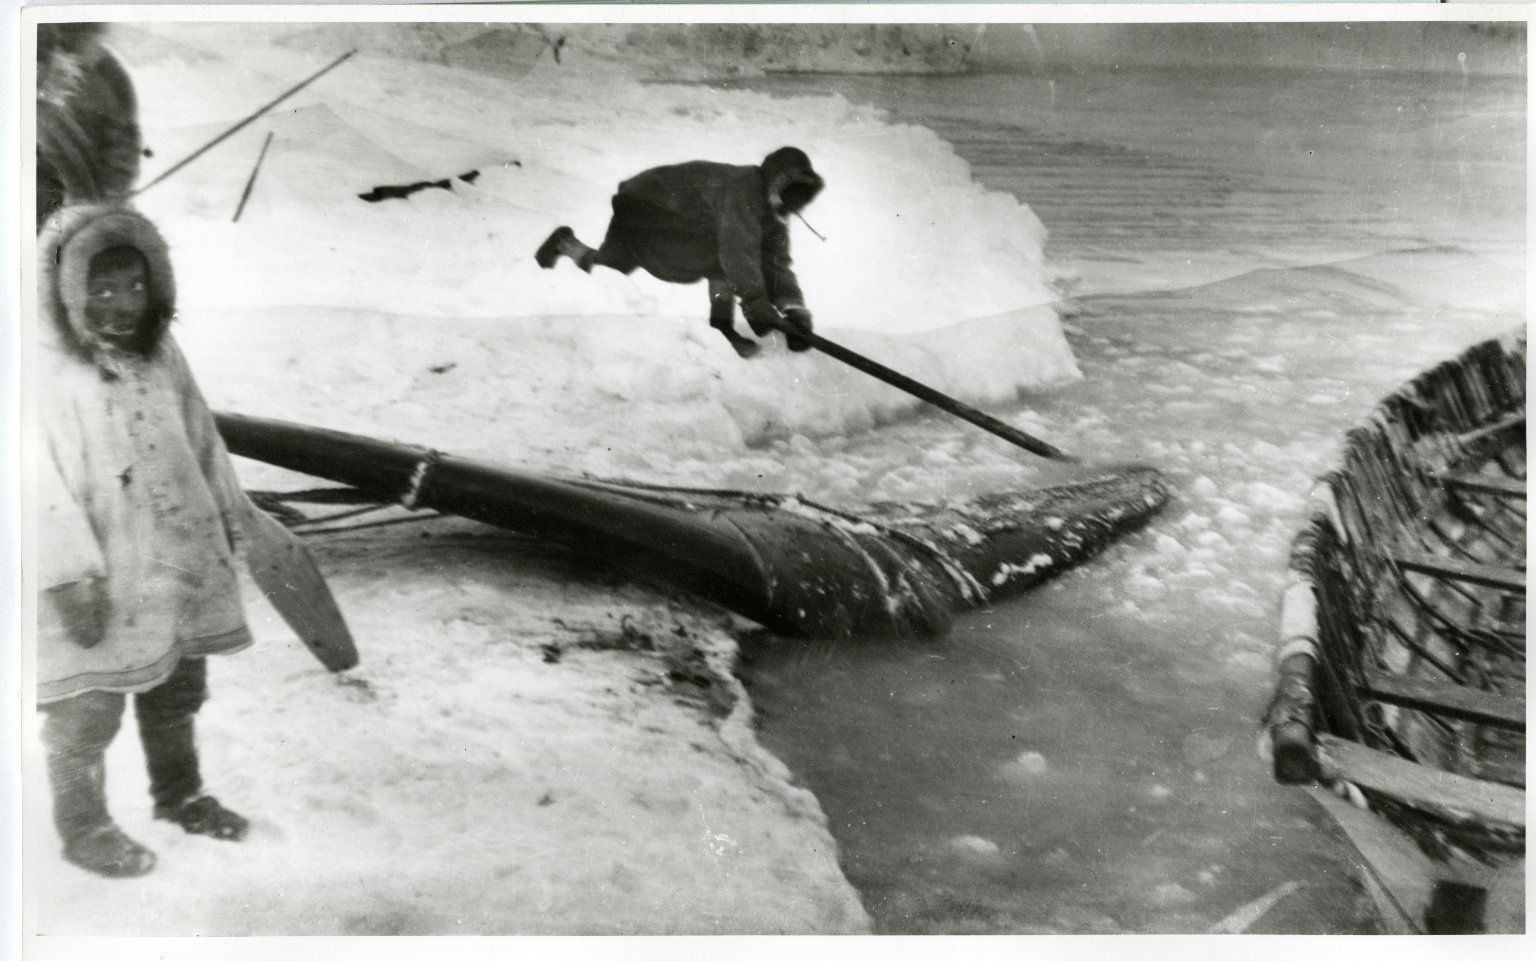 Eskimo whalers hauling whale ashore